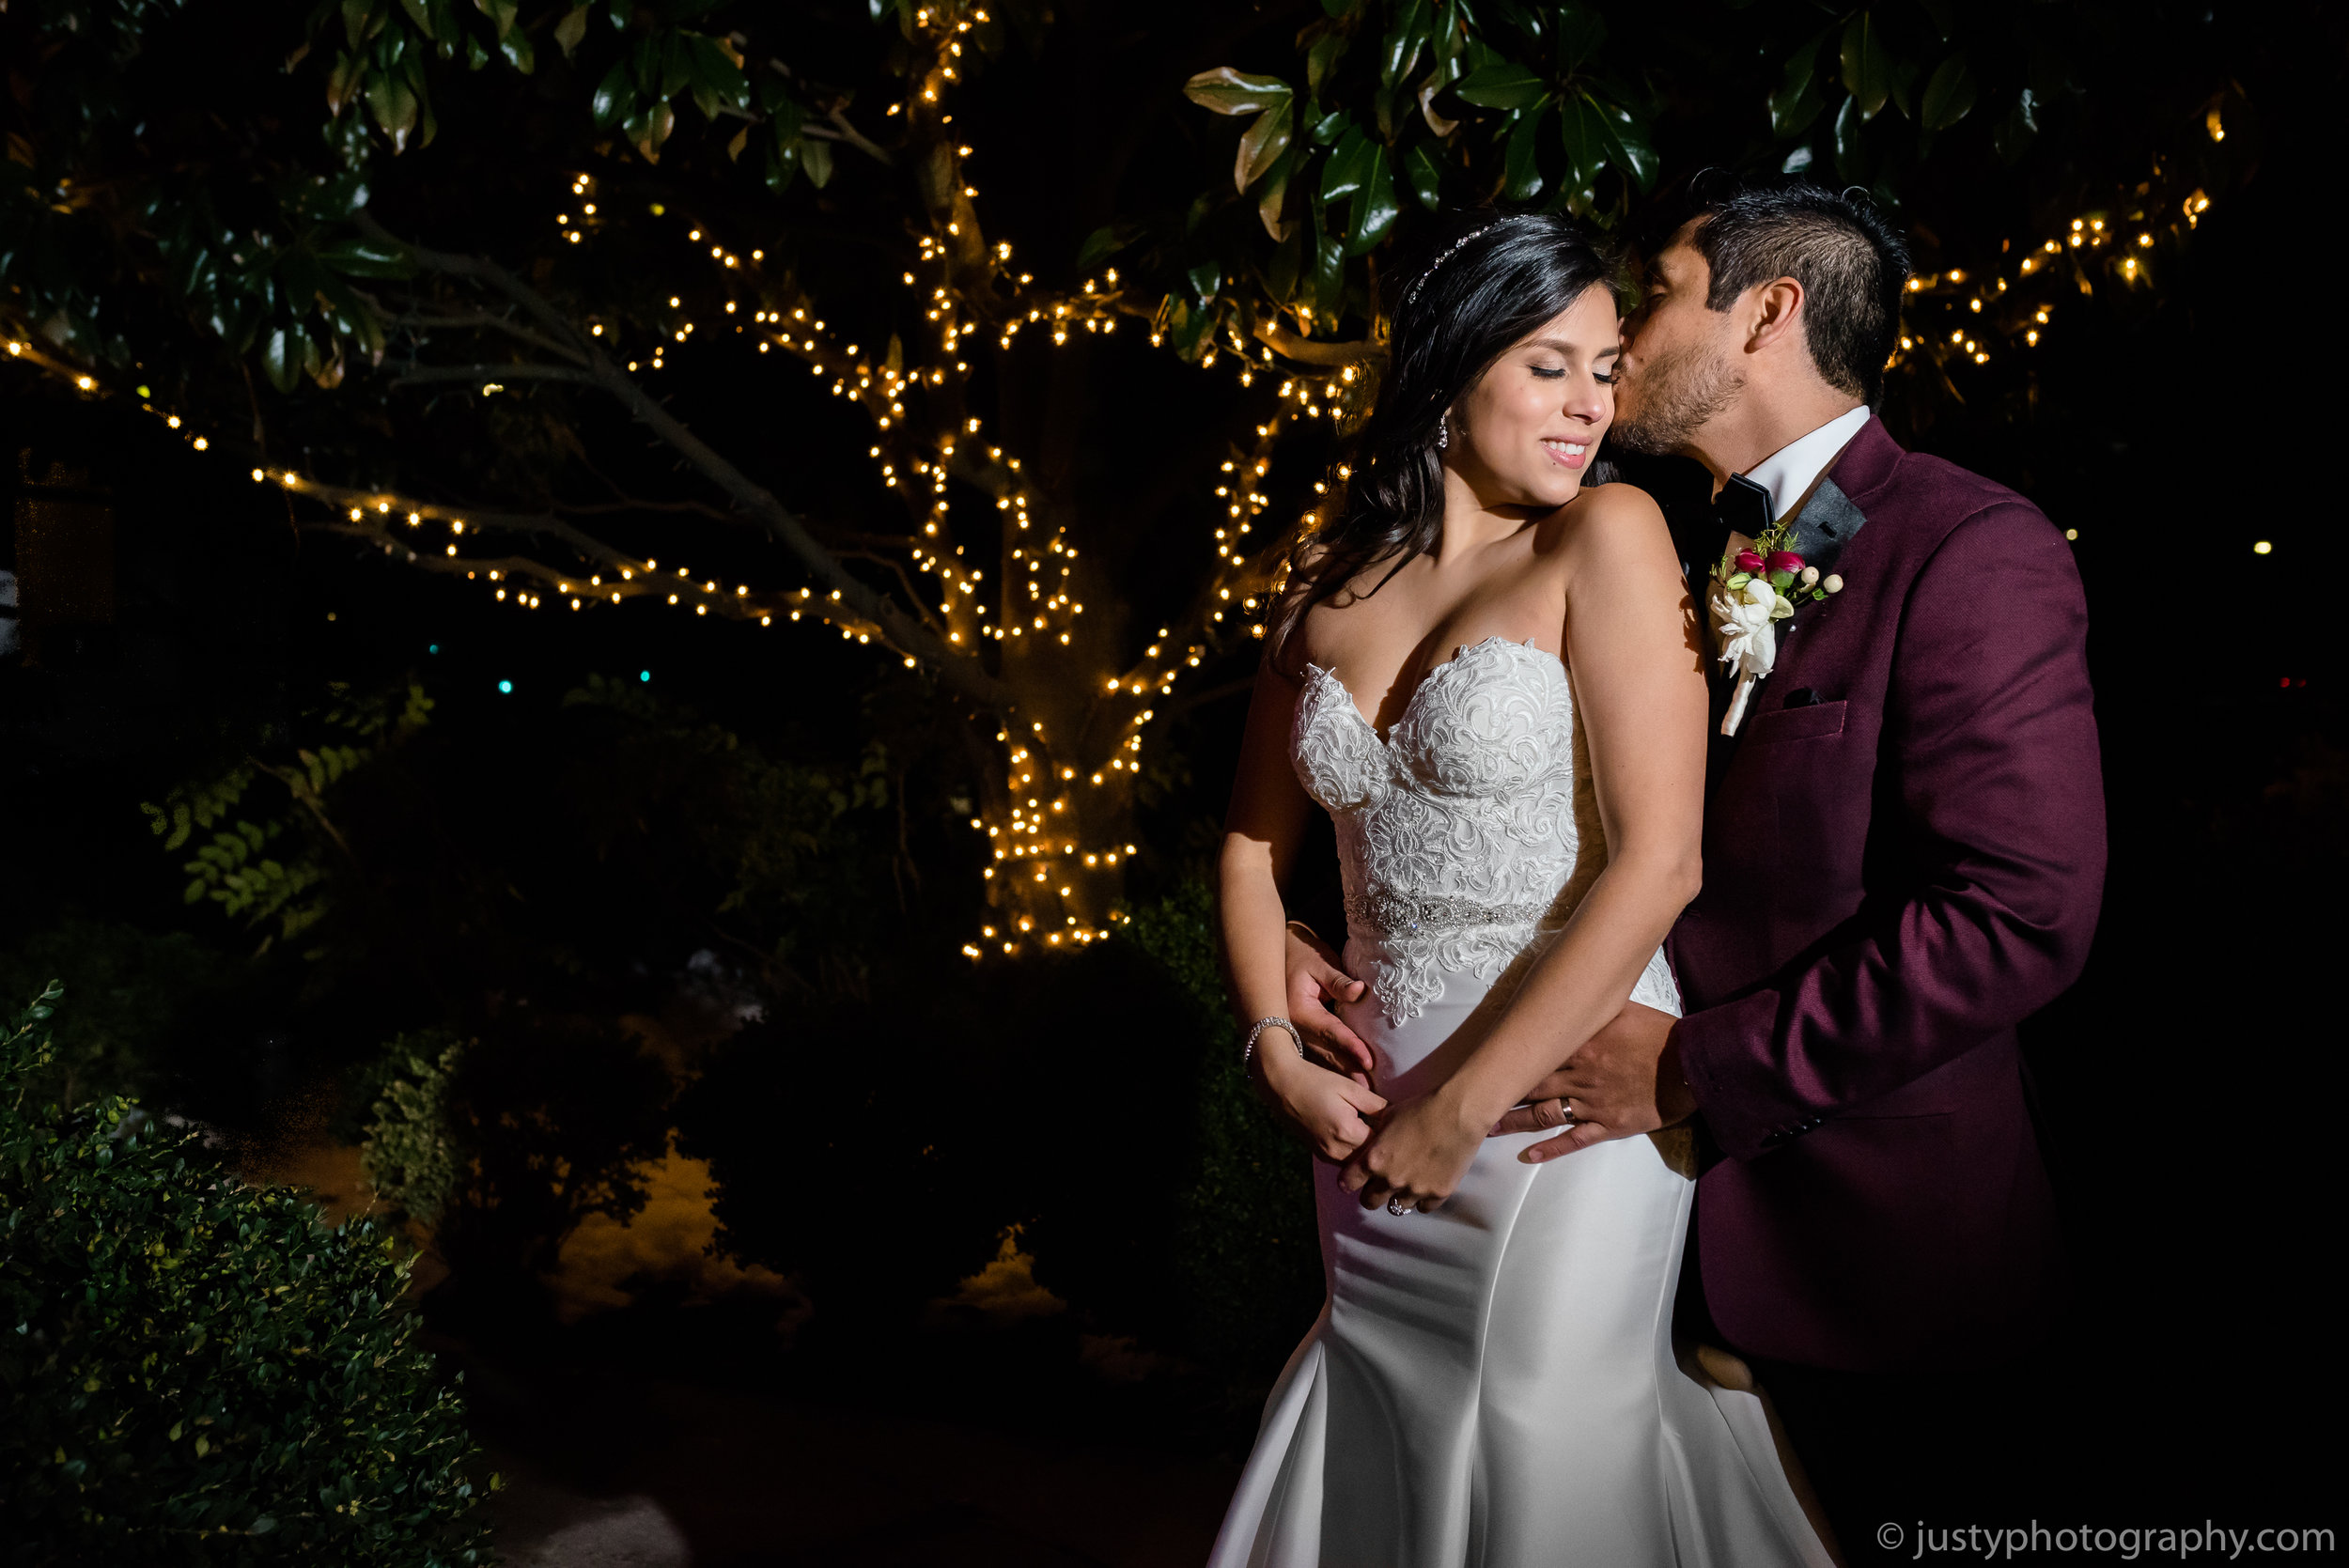 Ceresville Mansion Wedding Photos- Bride and Groom Night Photo.jpg